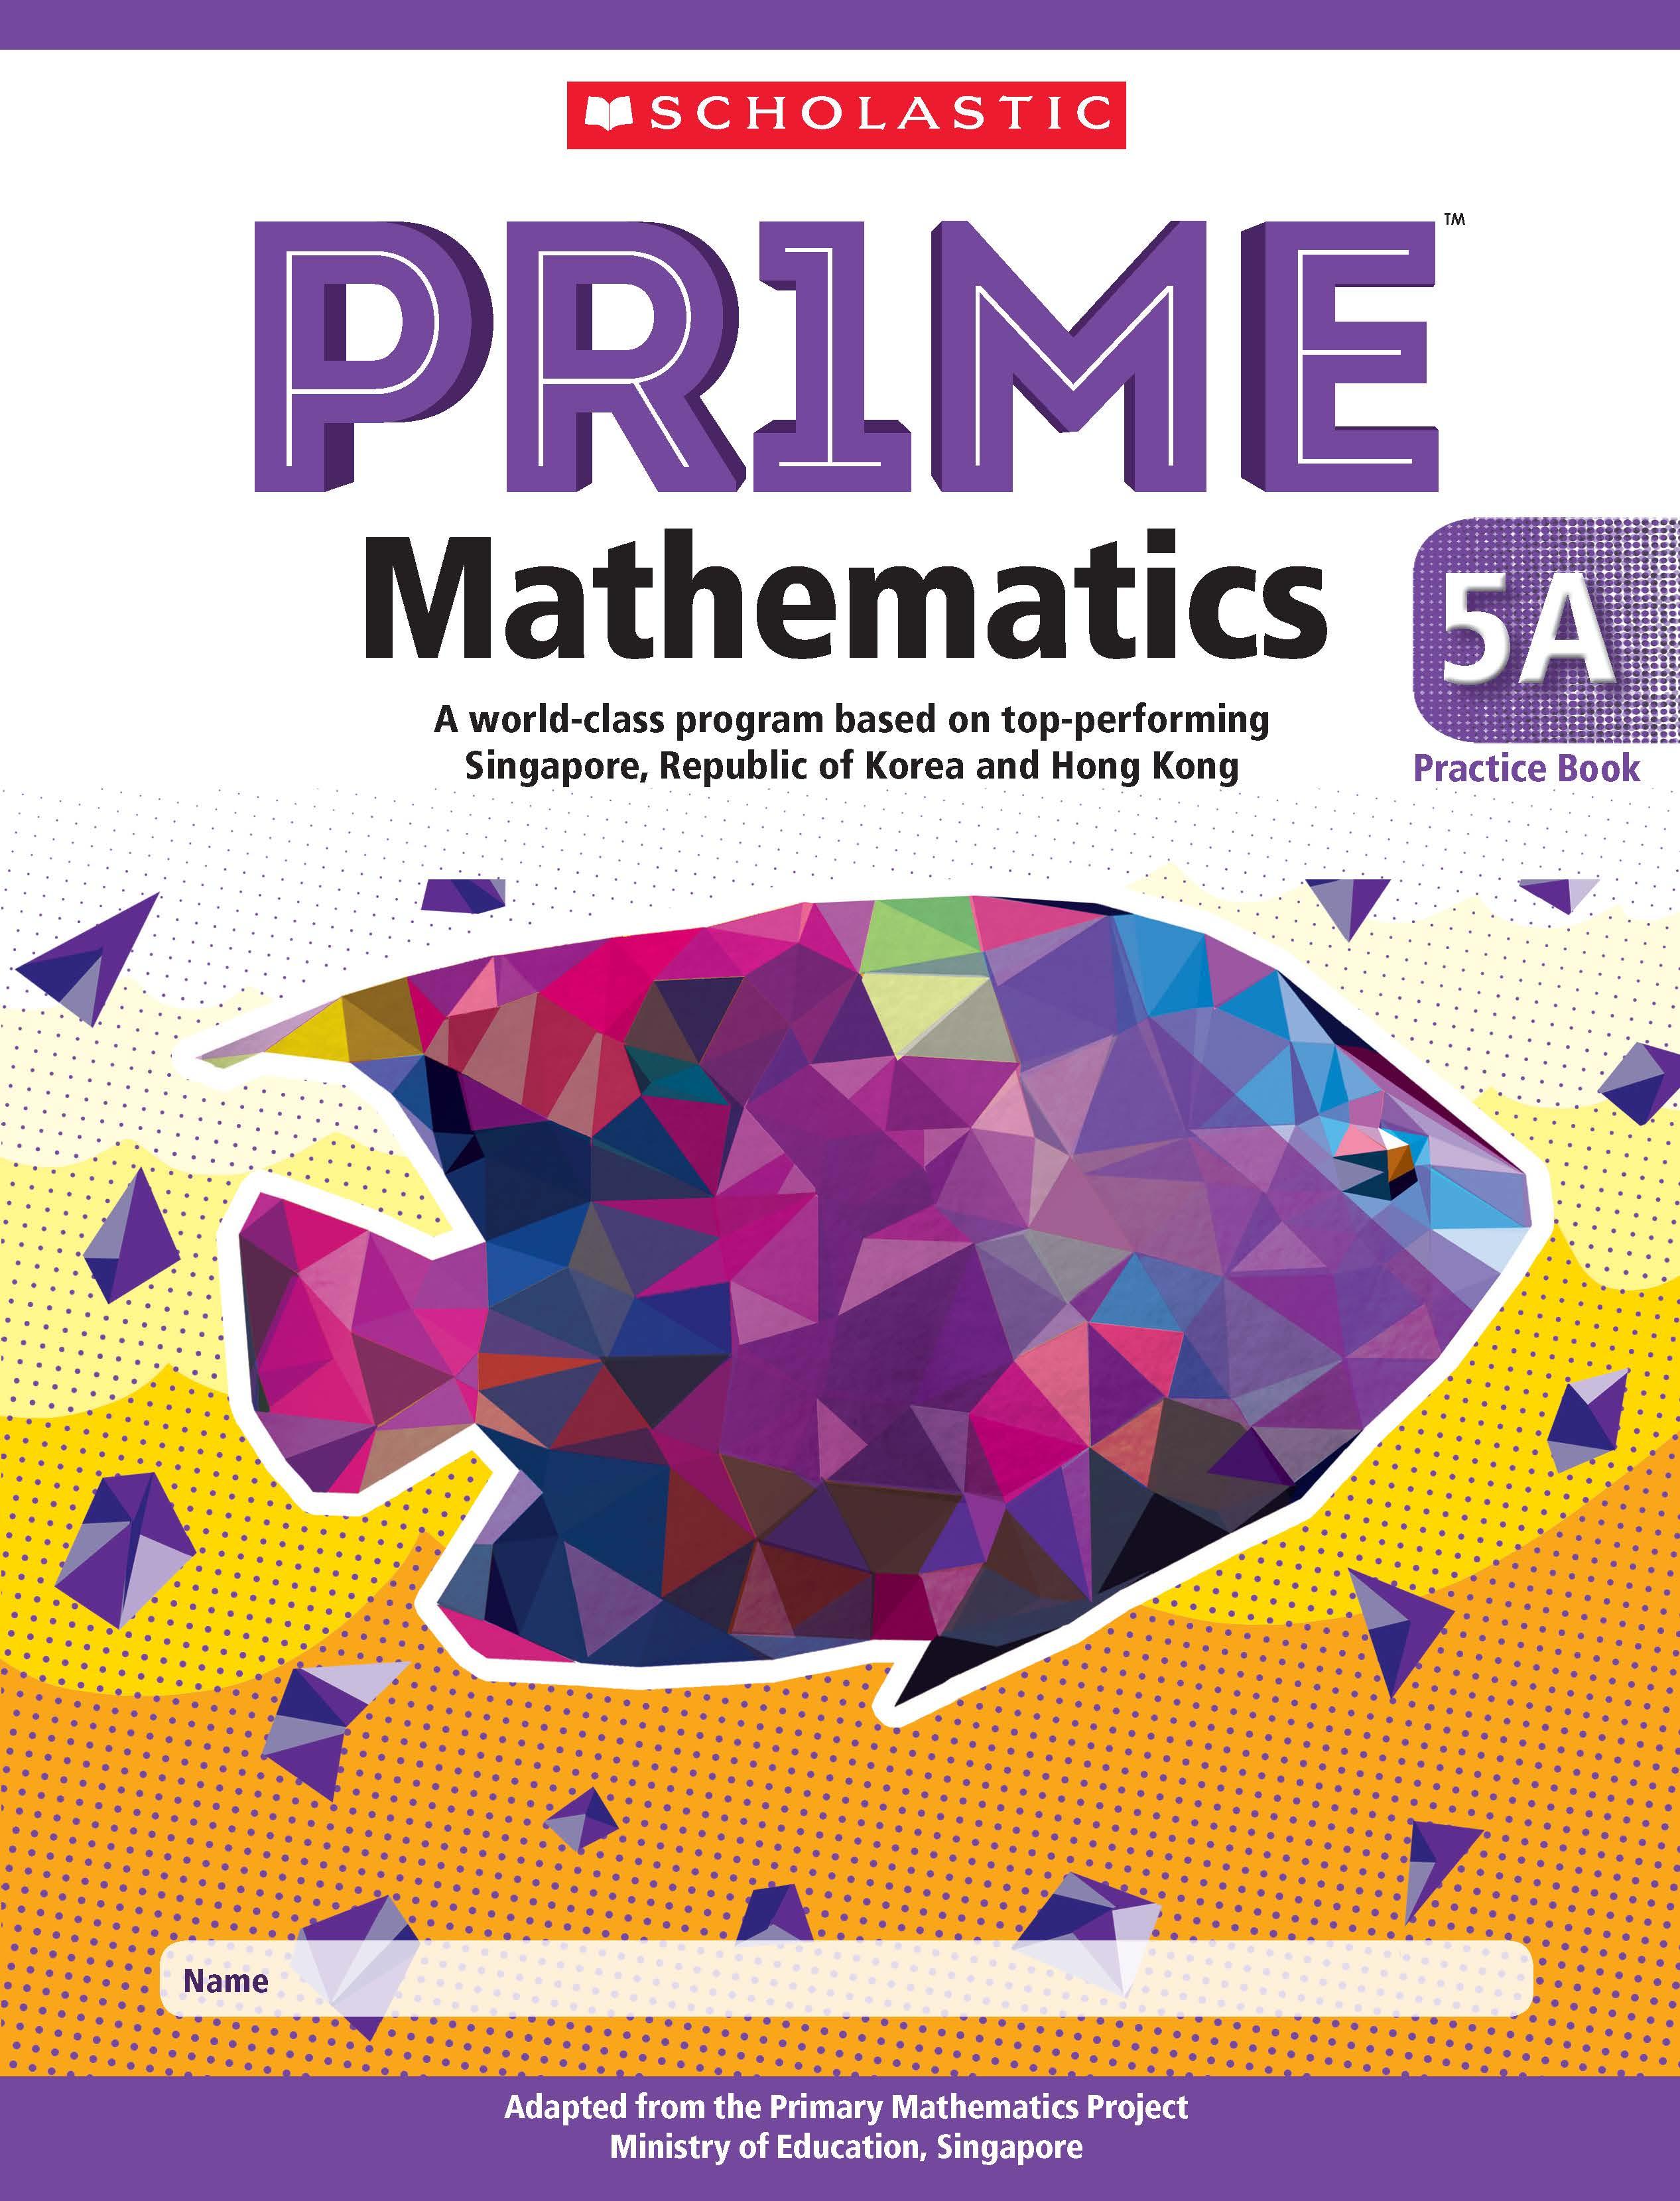 Prime Mathematics Practice Book 5A